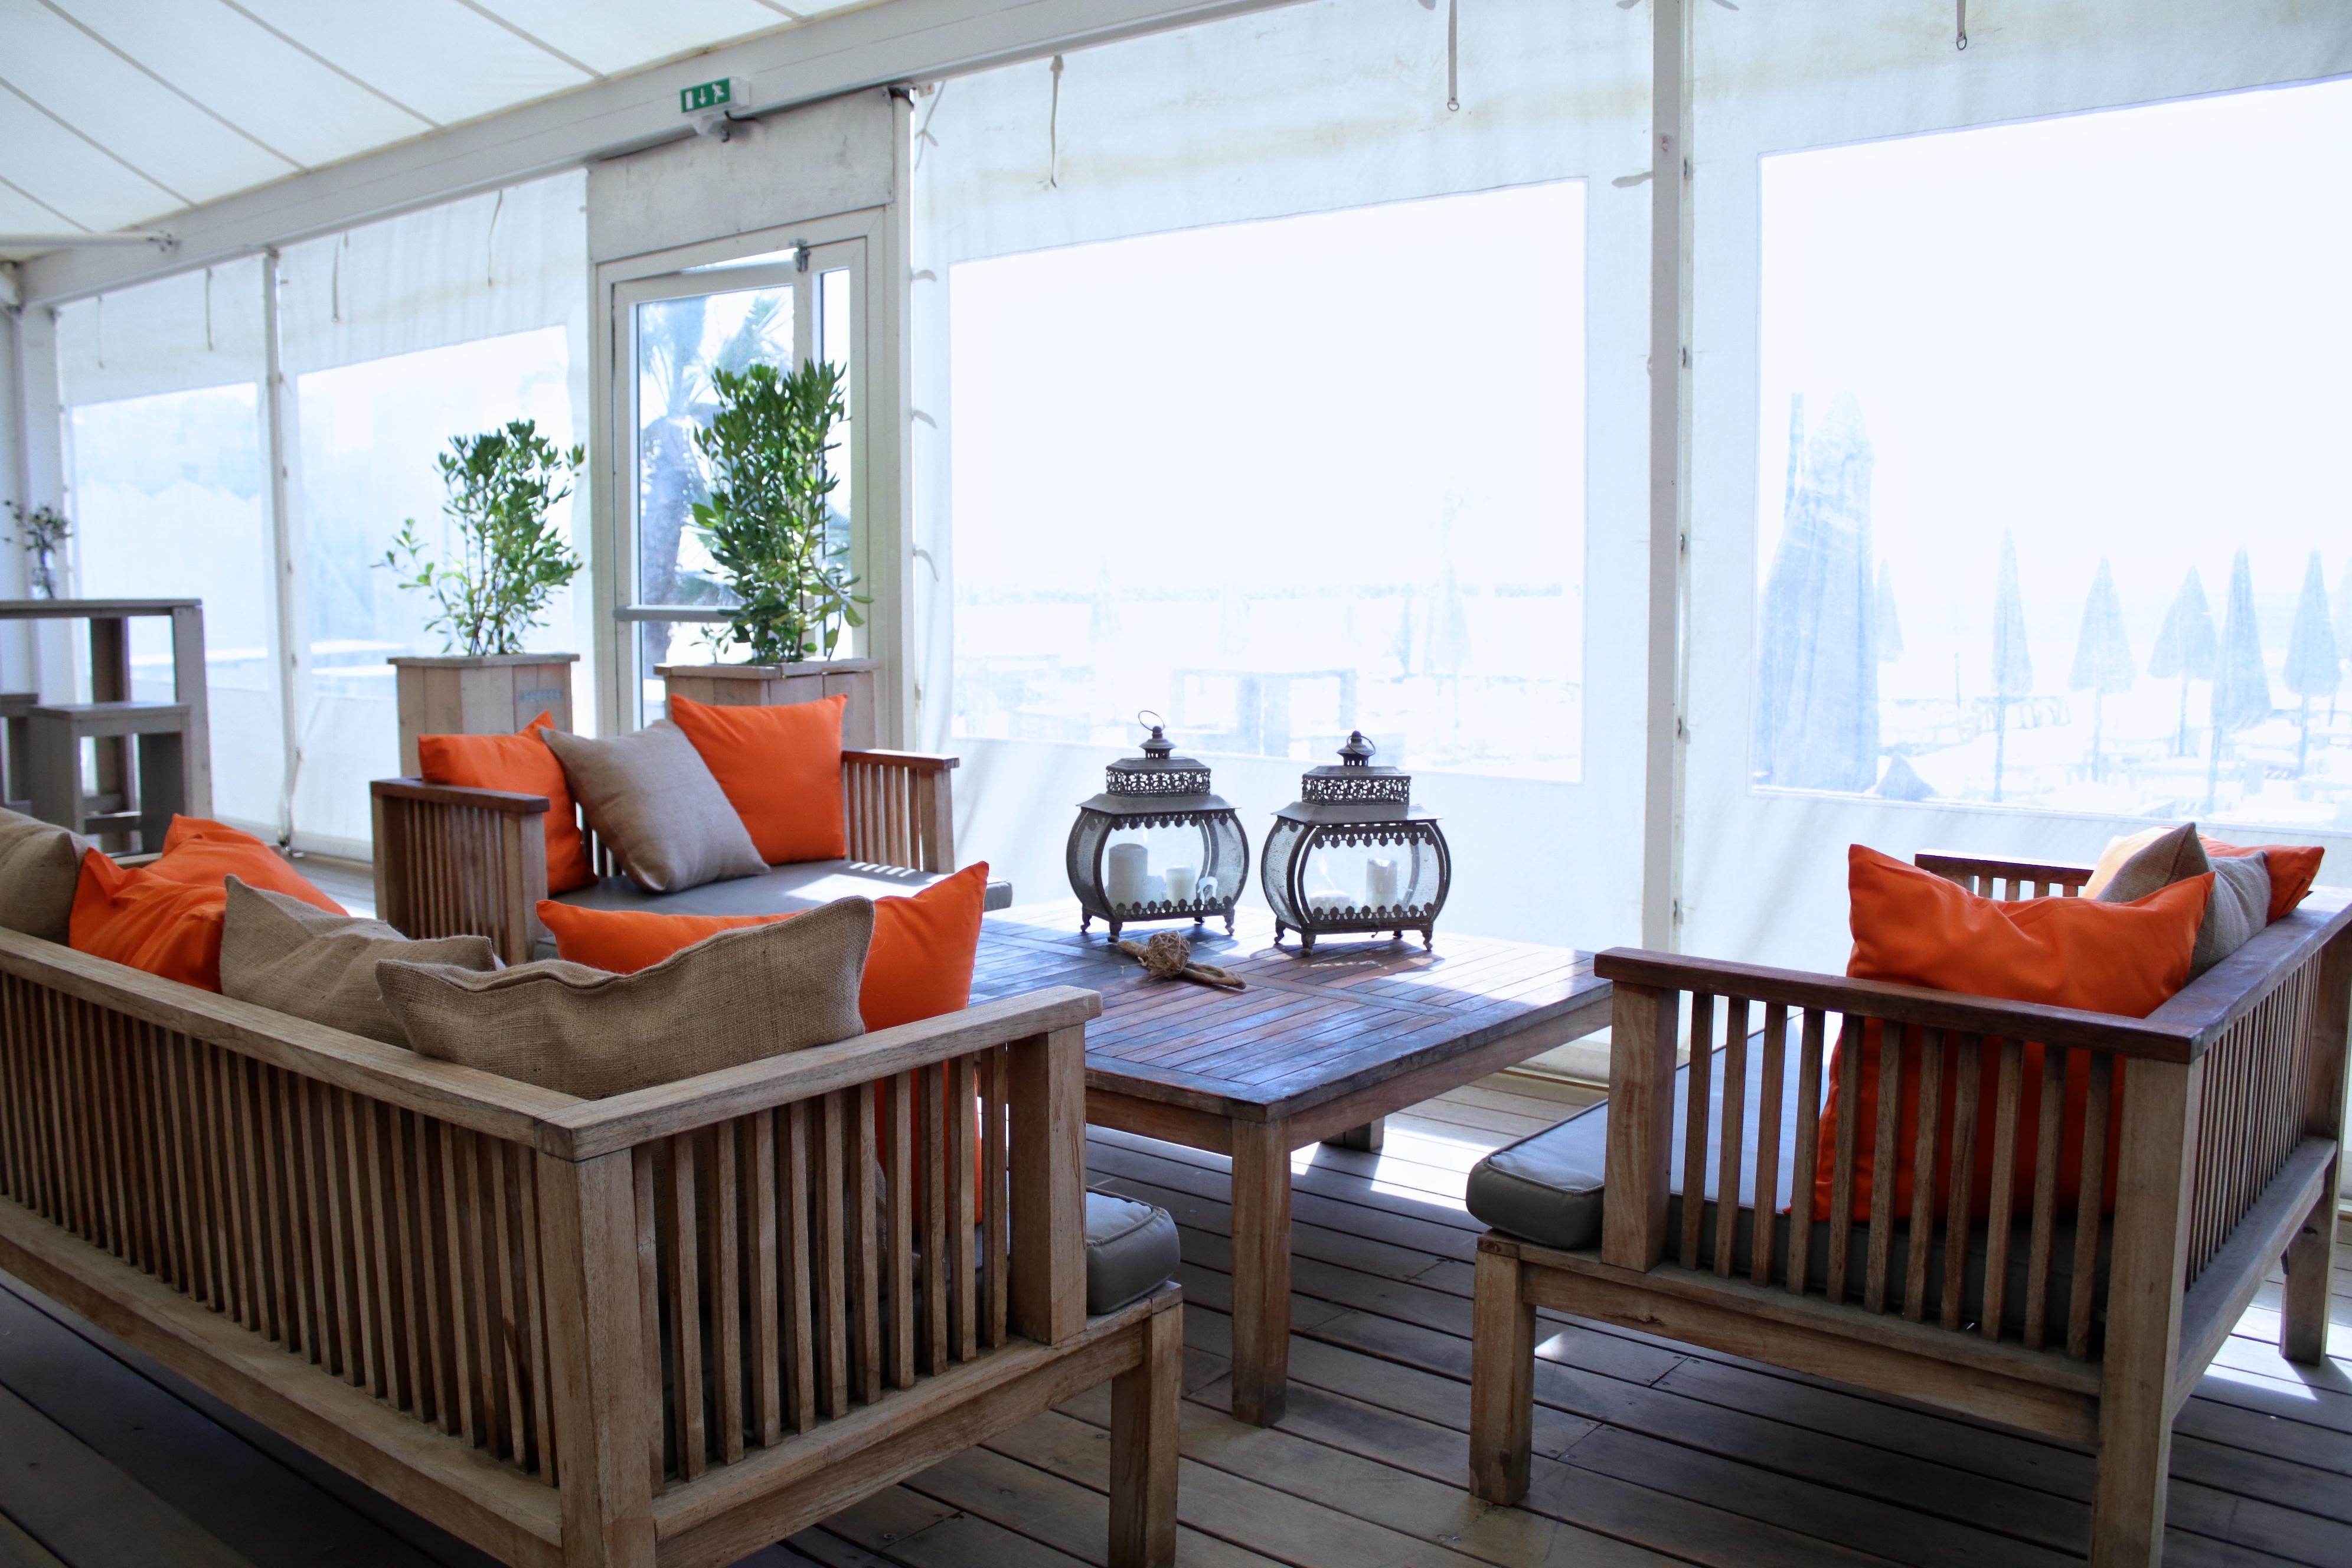 la grand plage boh me tribulations d 39 ana s. Black Bedroom Furniture Sets. Home Design Ideas